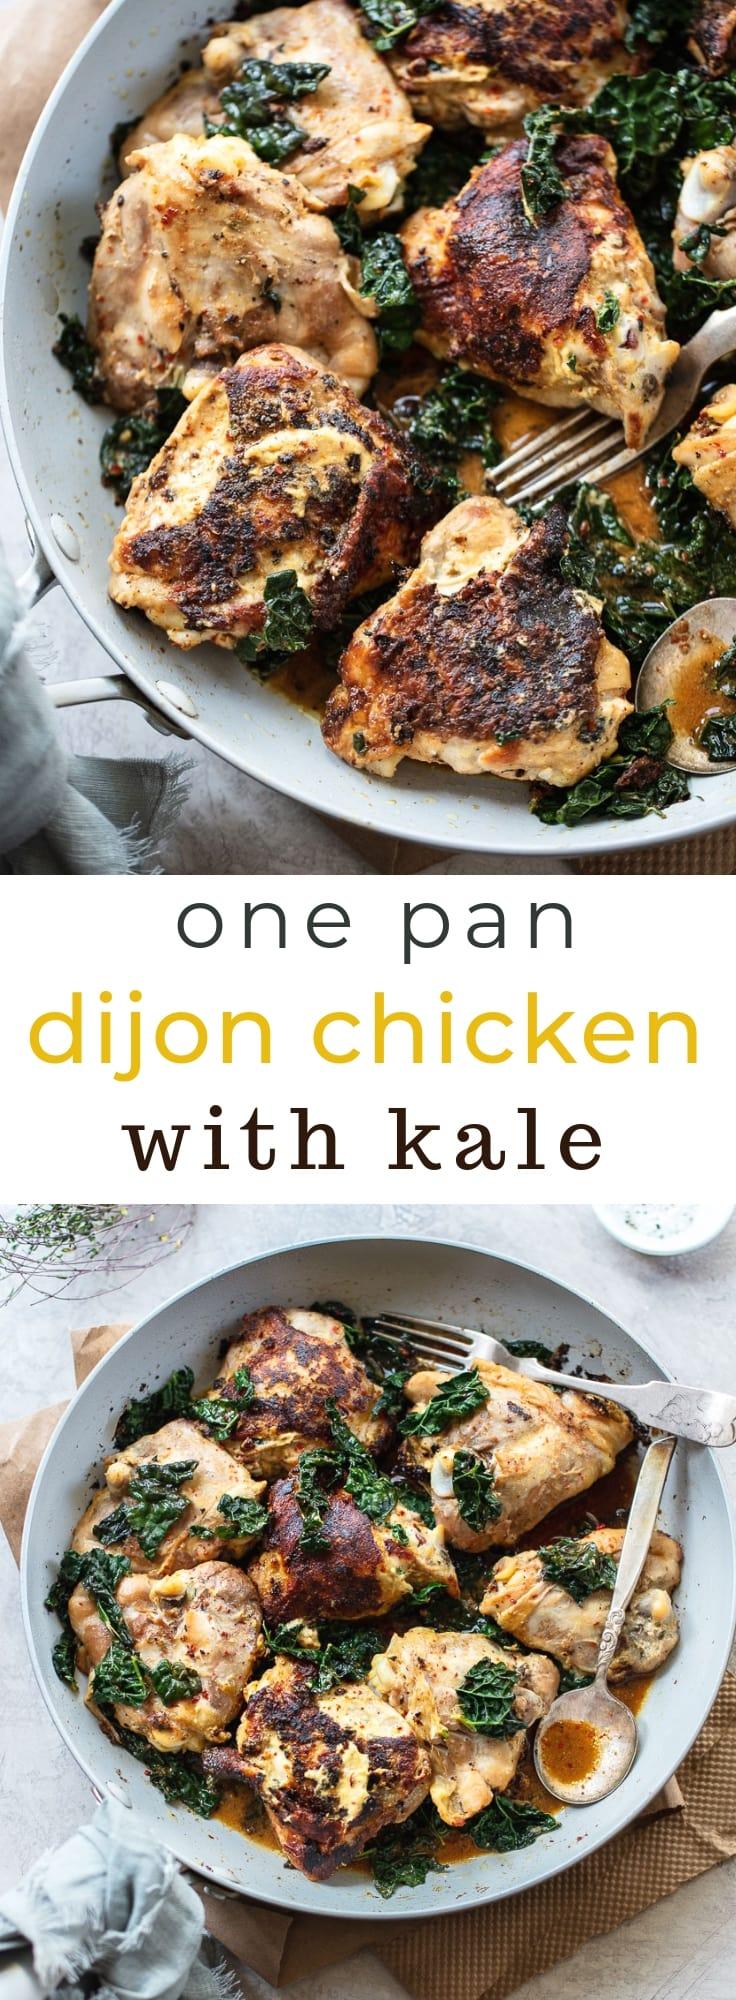 Skillet Dijon Chicken with Kale